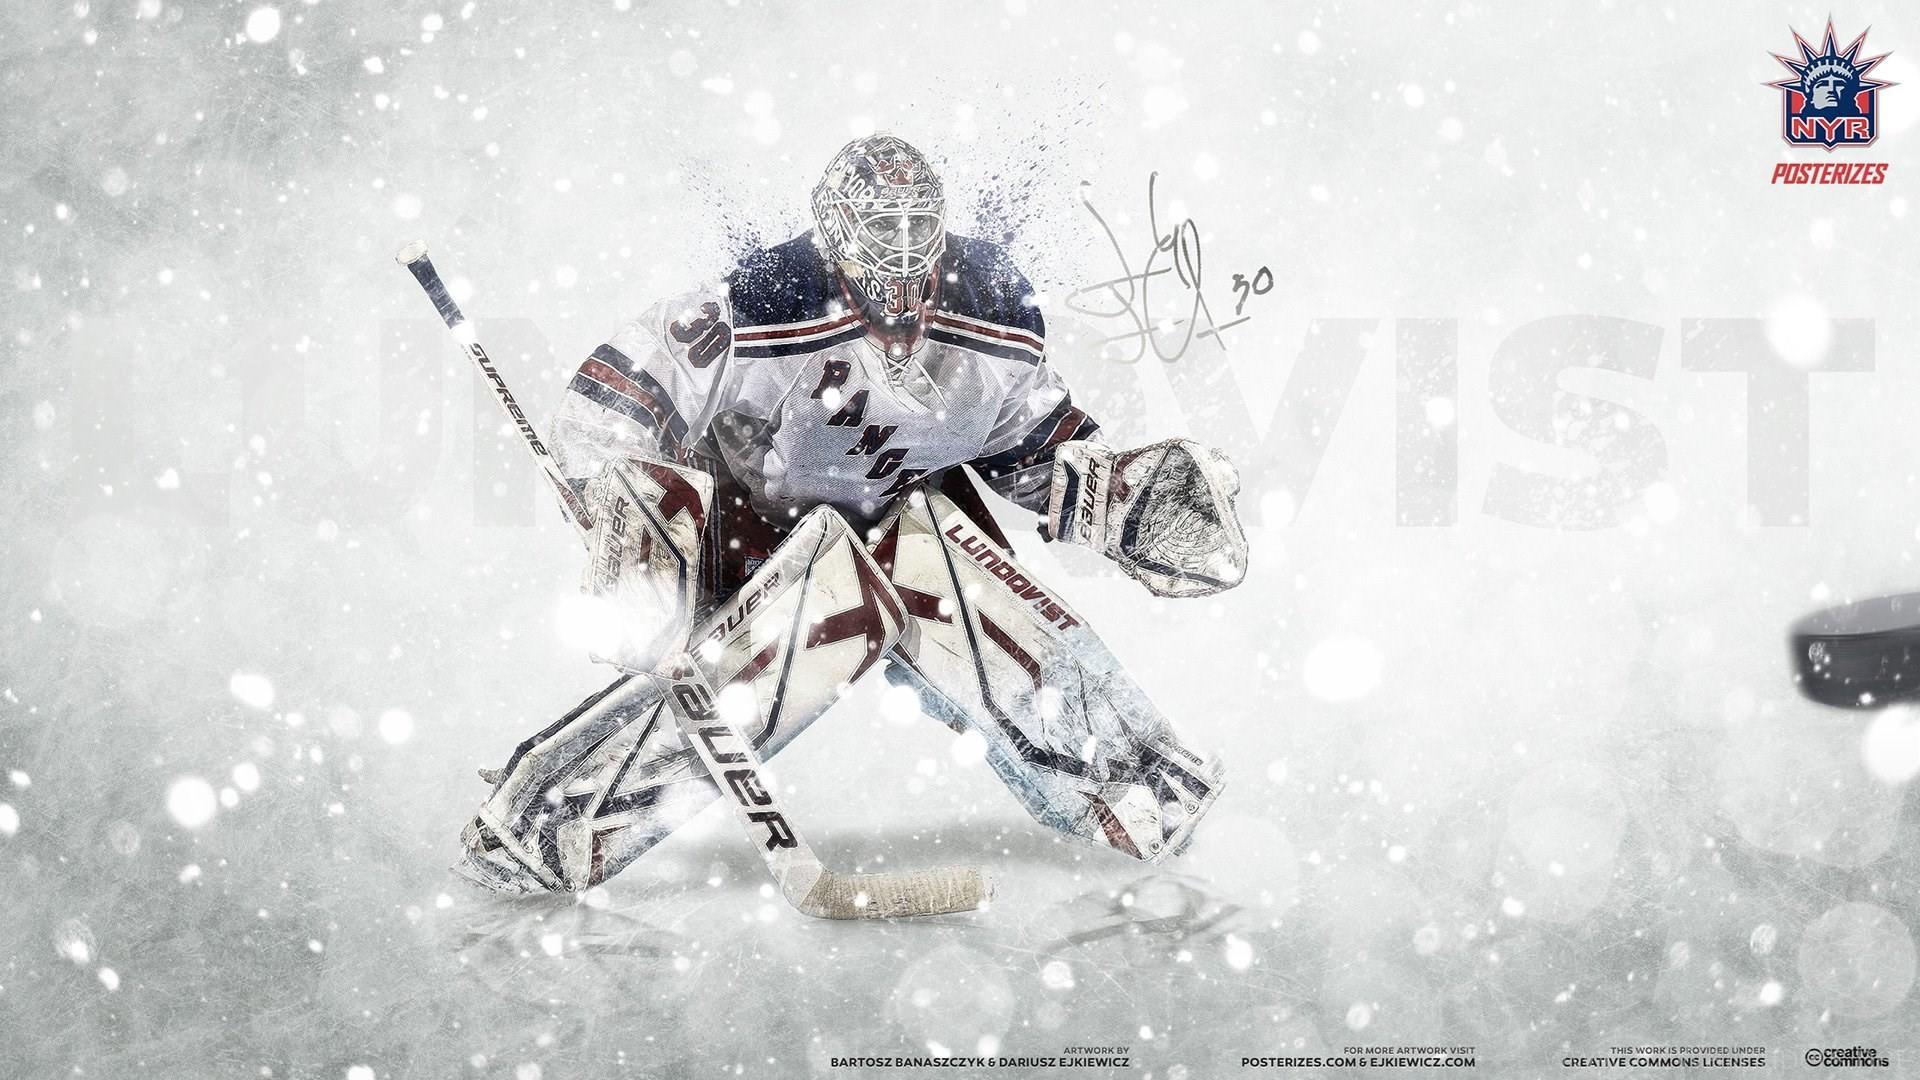 Wallpapers Nhl Goalie Henrik Lundqvist New York Rangers .